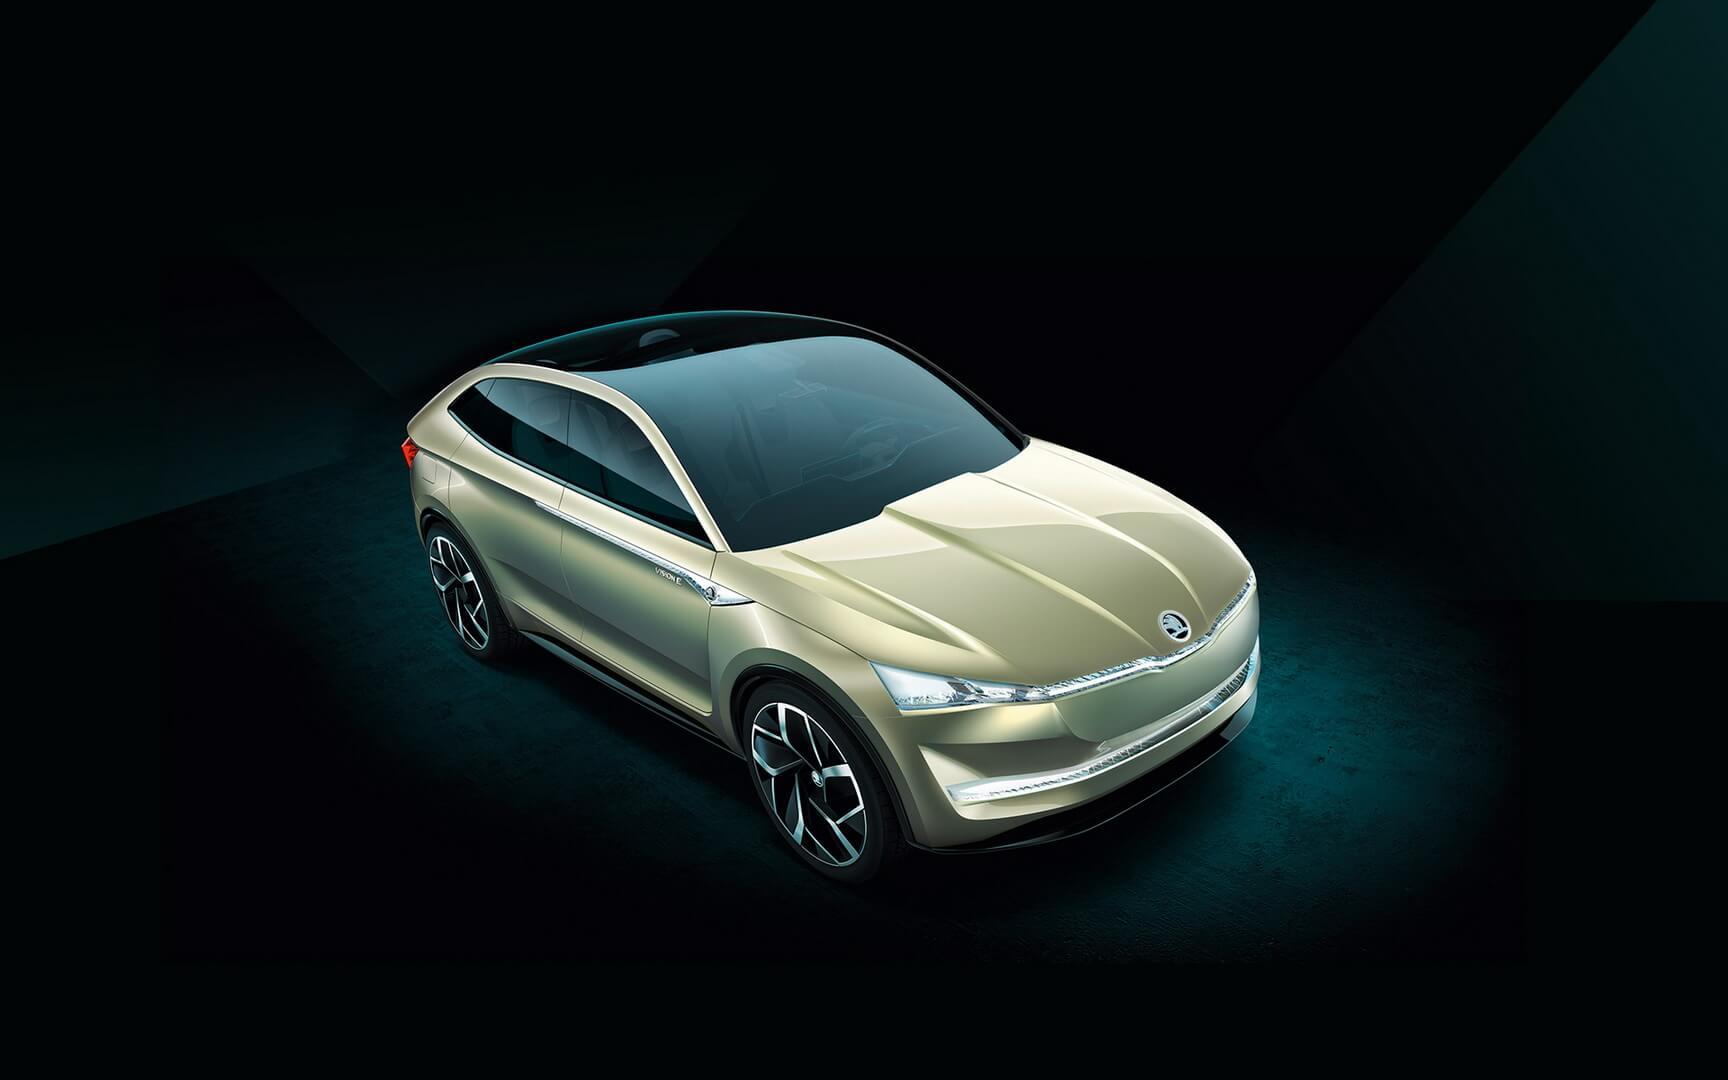 Европейский концепт электромобиля Vision E